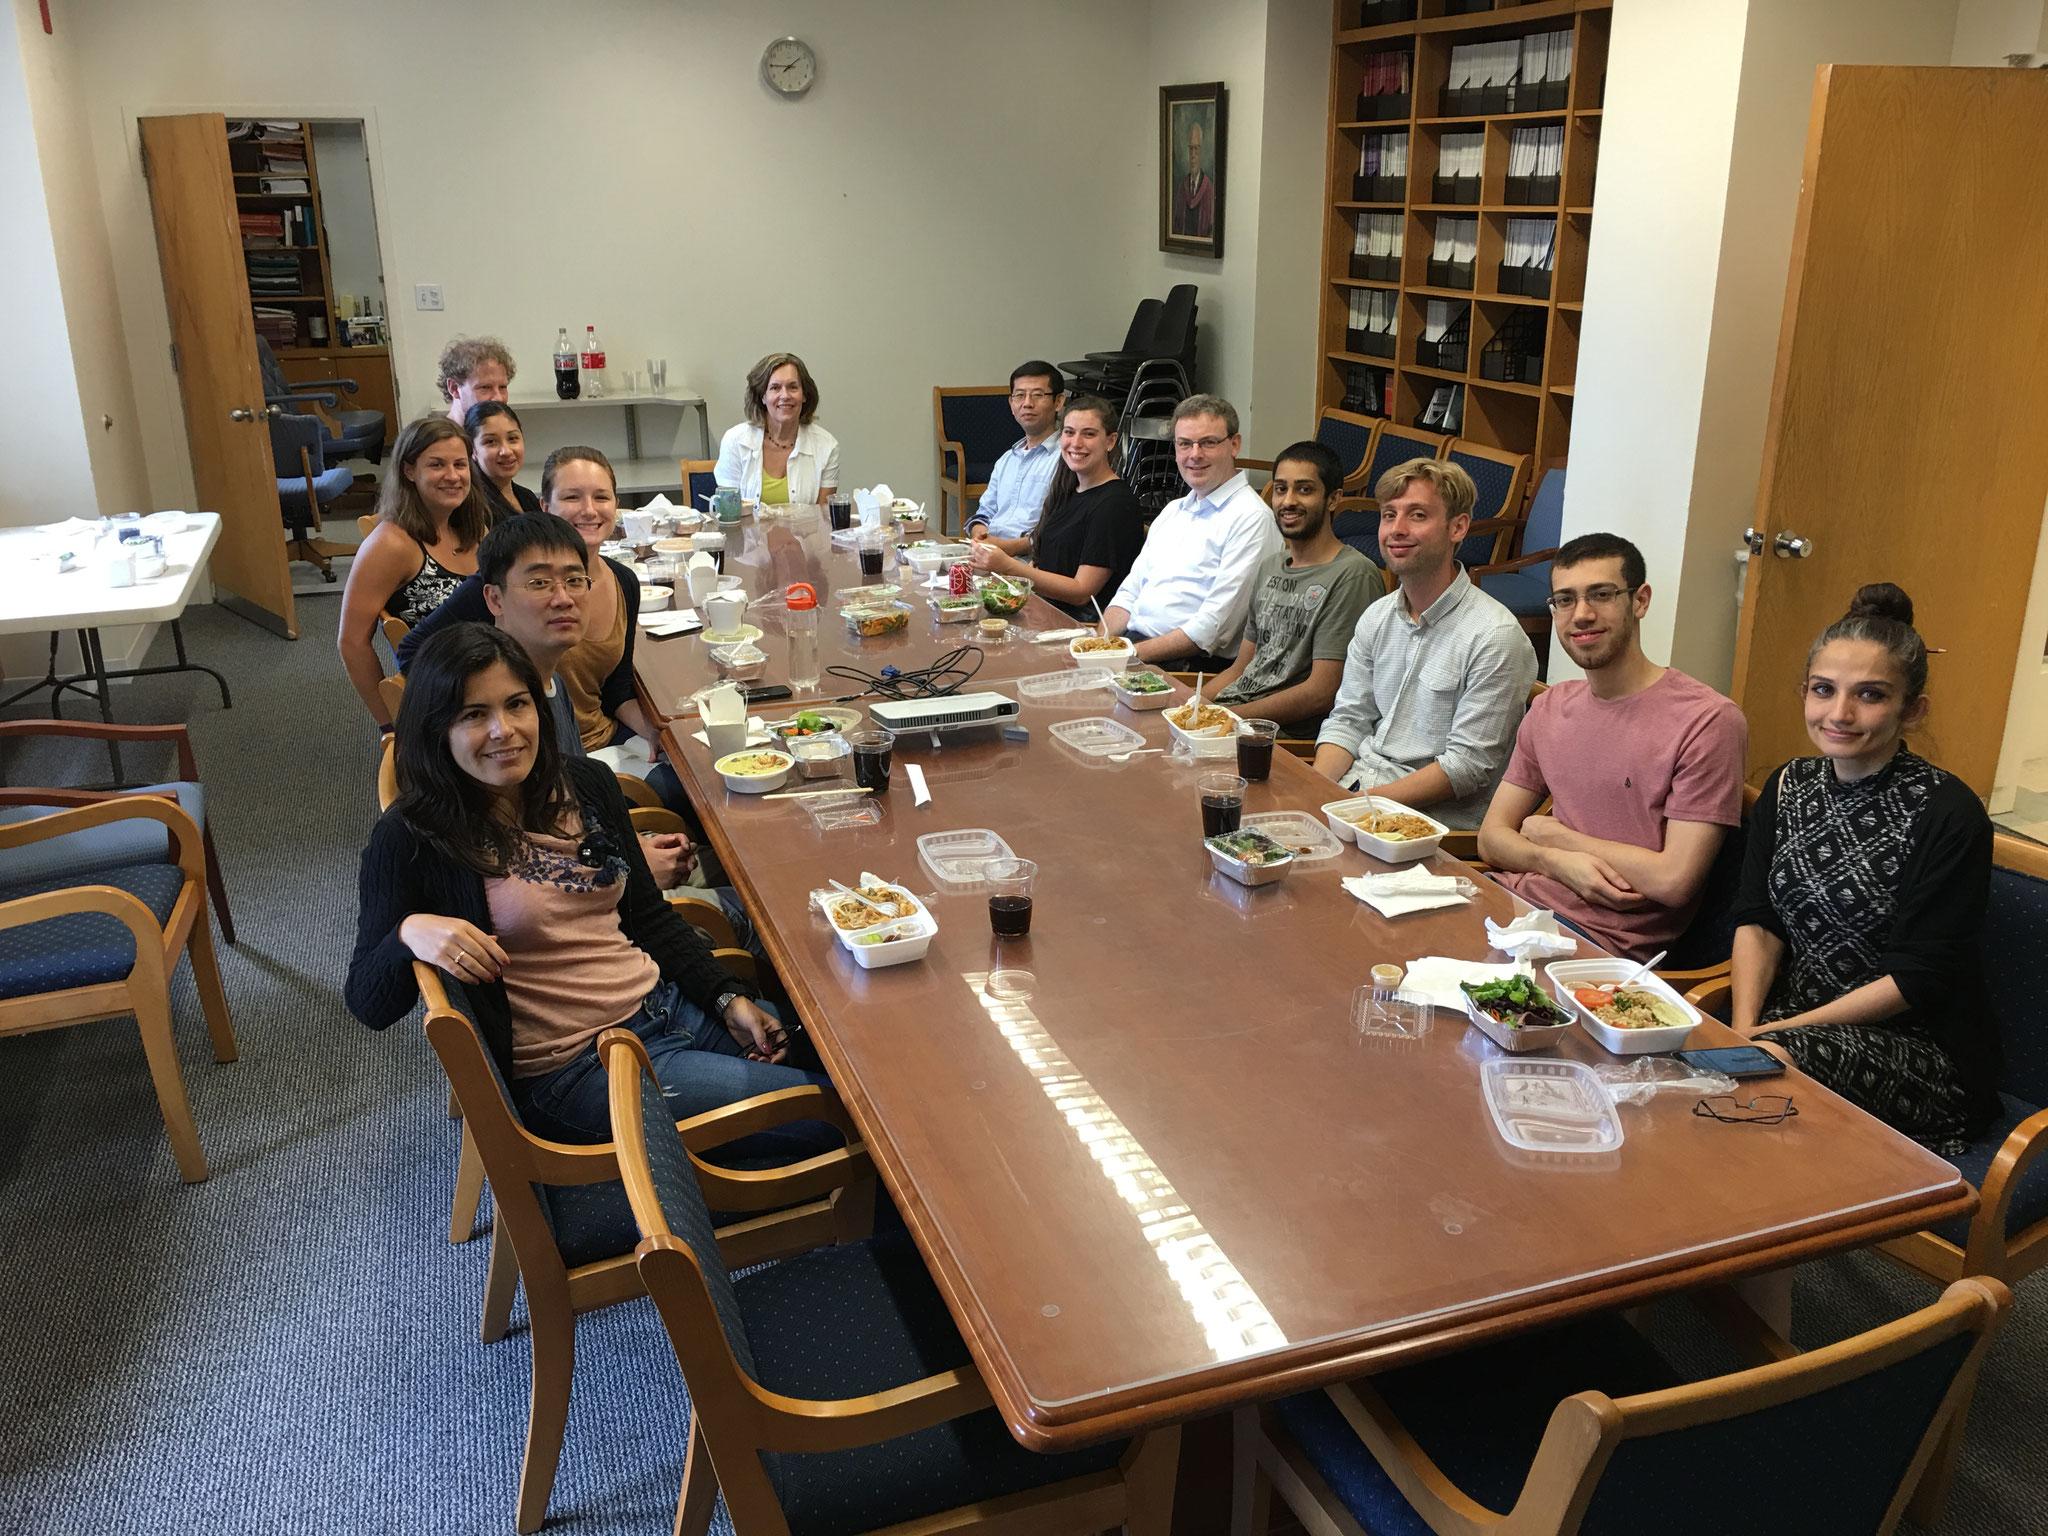 Nigel & Dalyia's luncheon with lab, 7-29-16